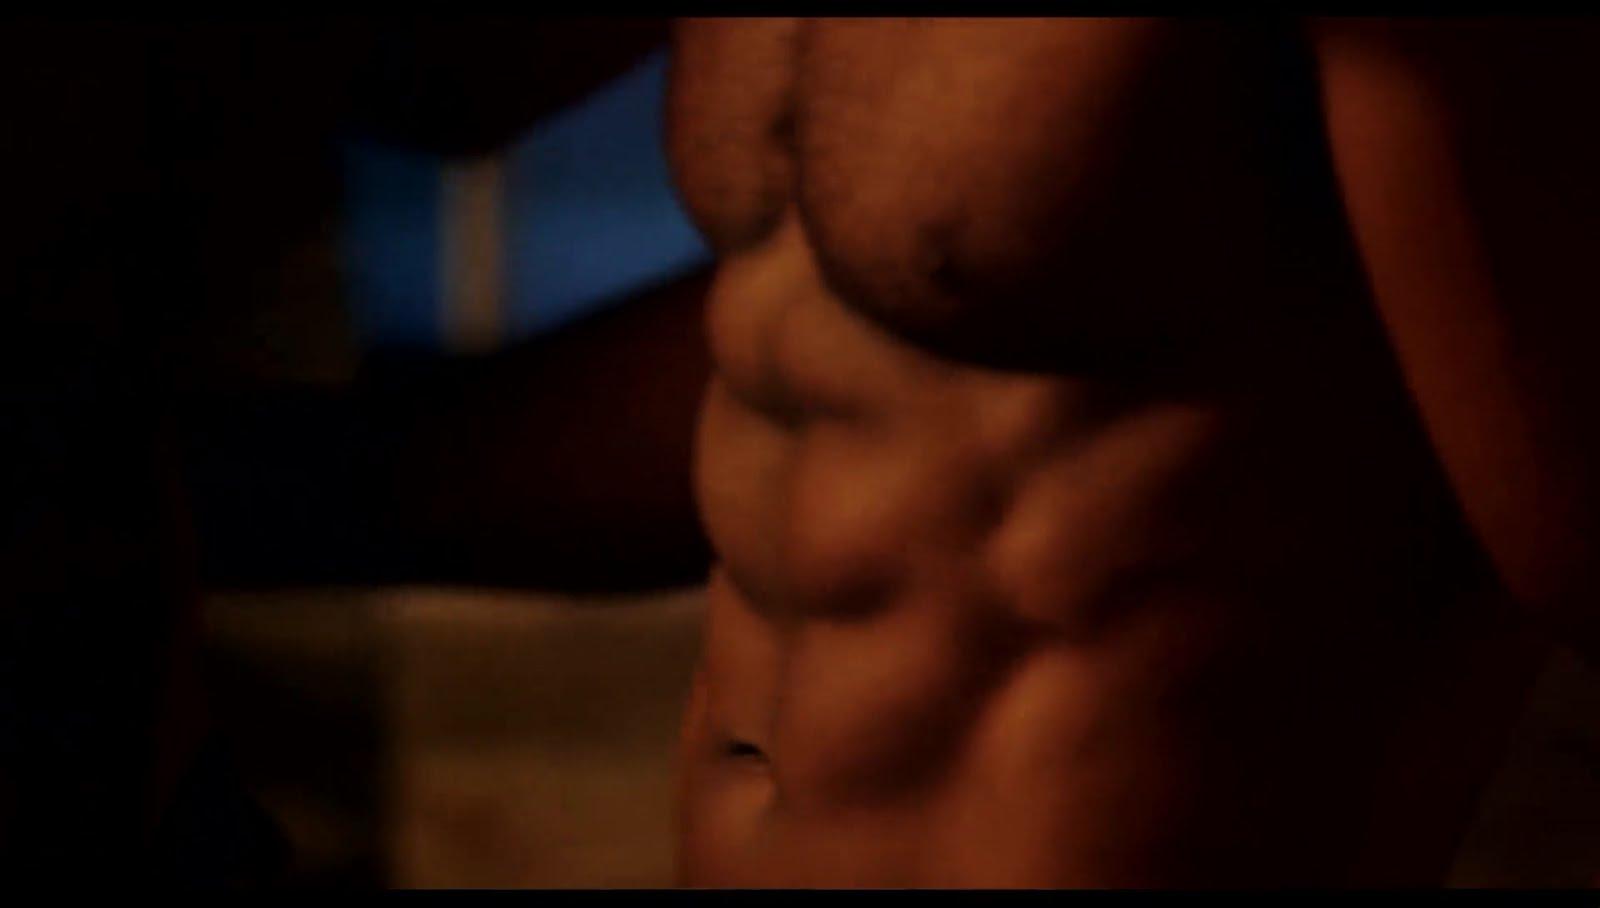 Anthony Pecoraro Porn shirtless men on the blog: robby stahl & juahn cabrera